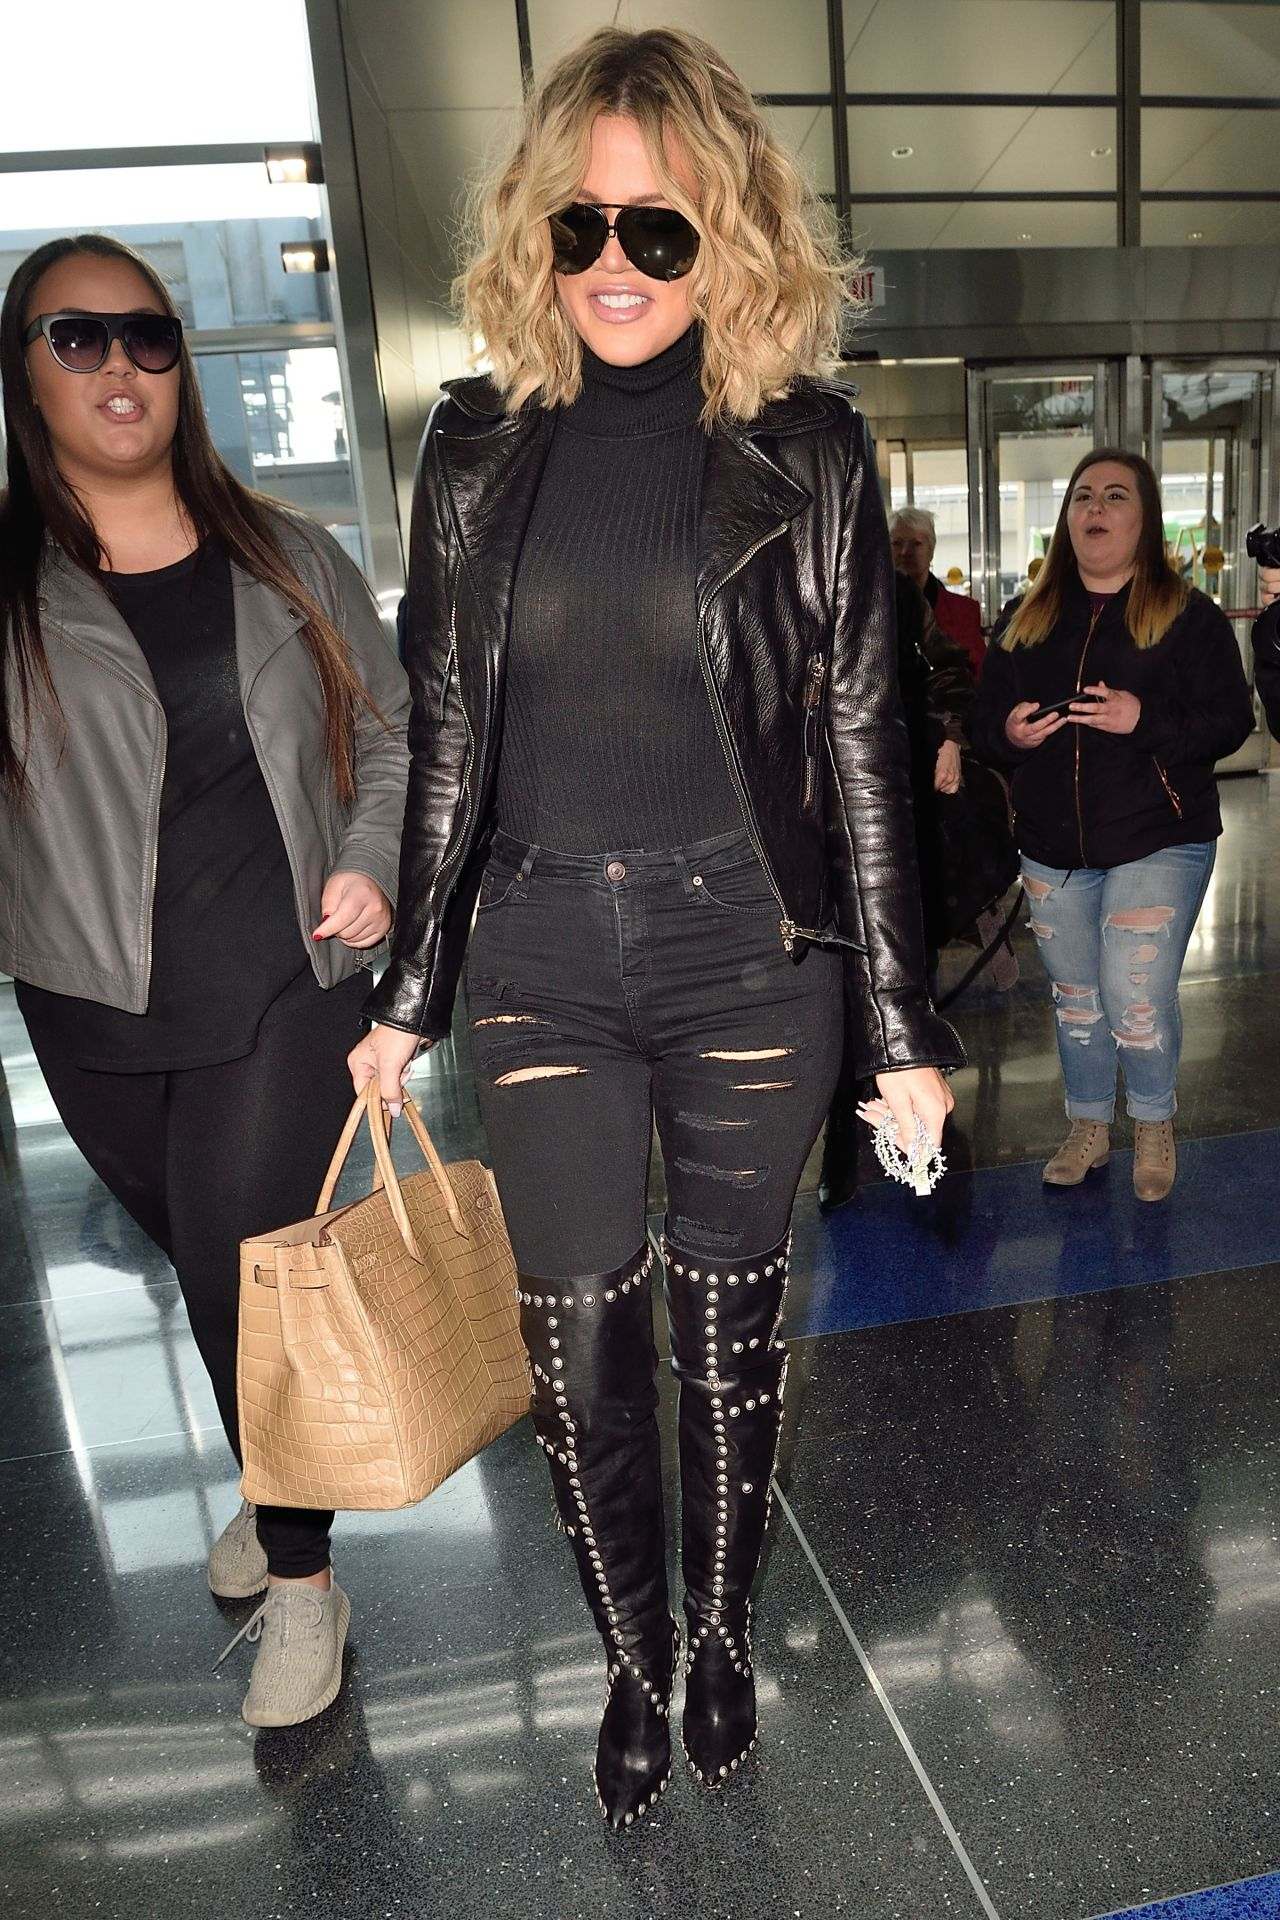 Khloe Kardashian At Jfk Airport In New York City 1 15 2016